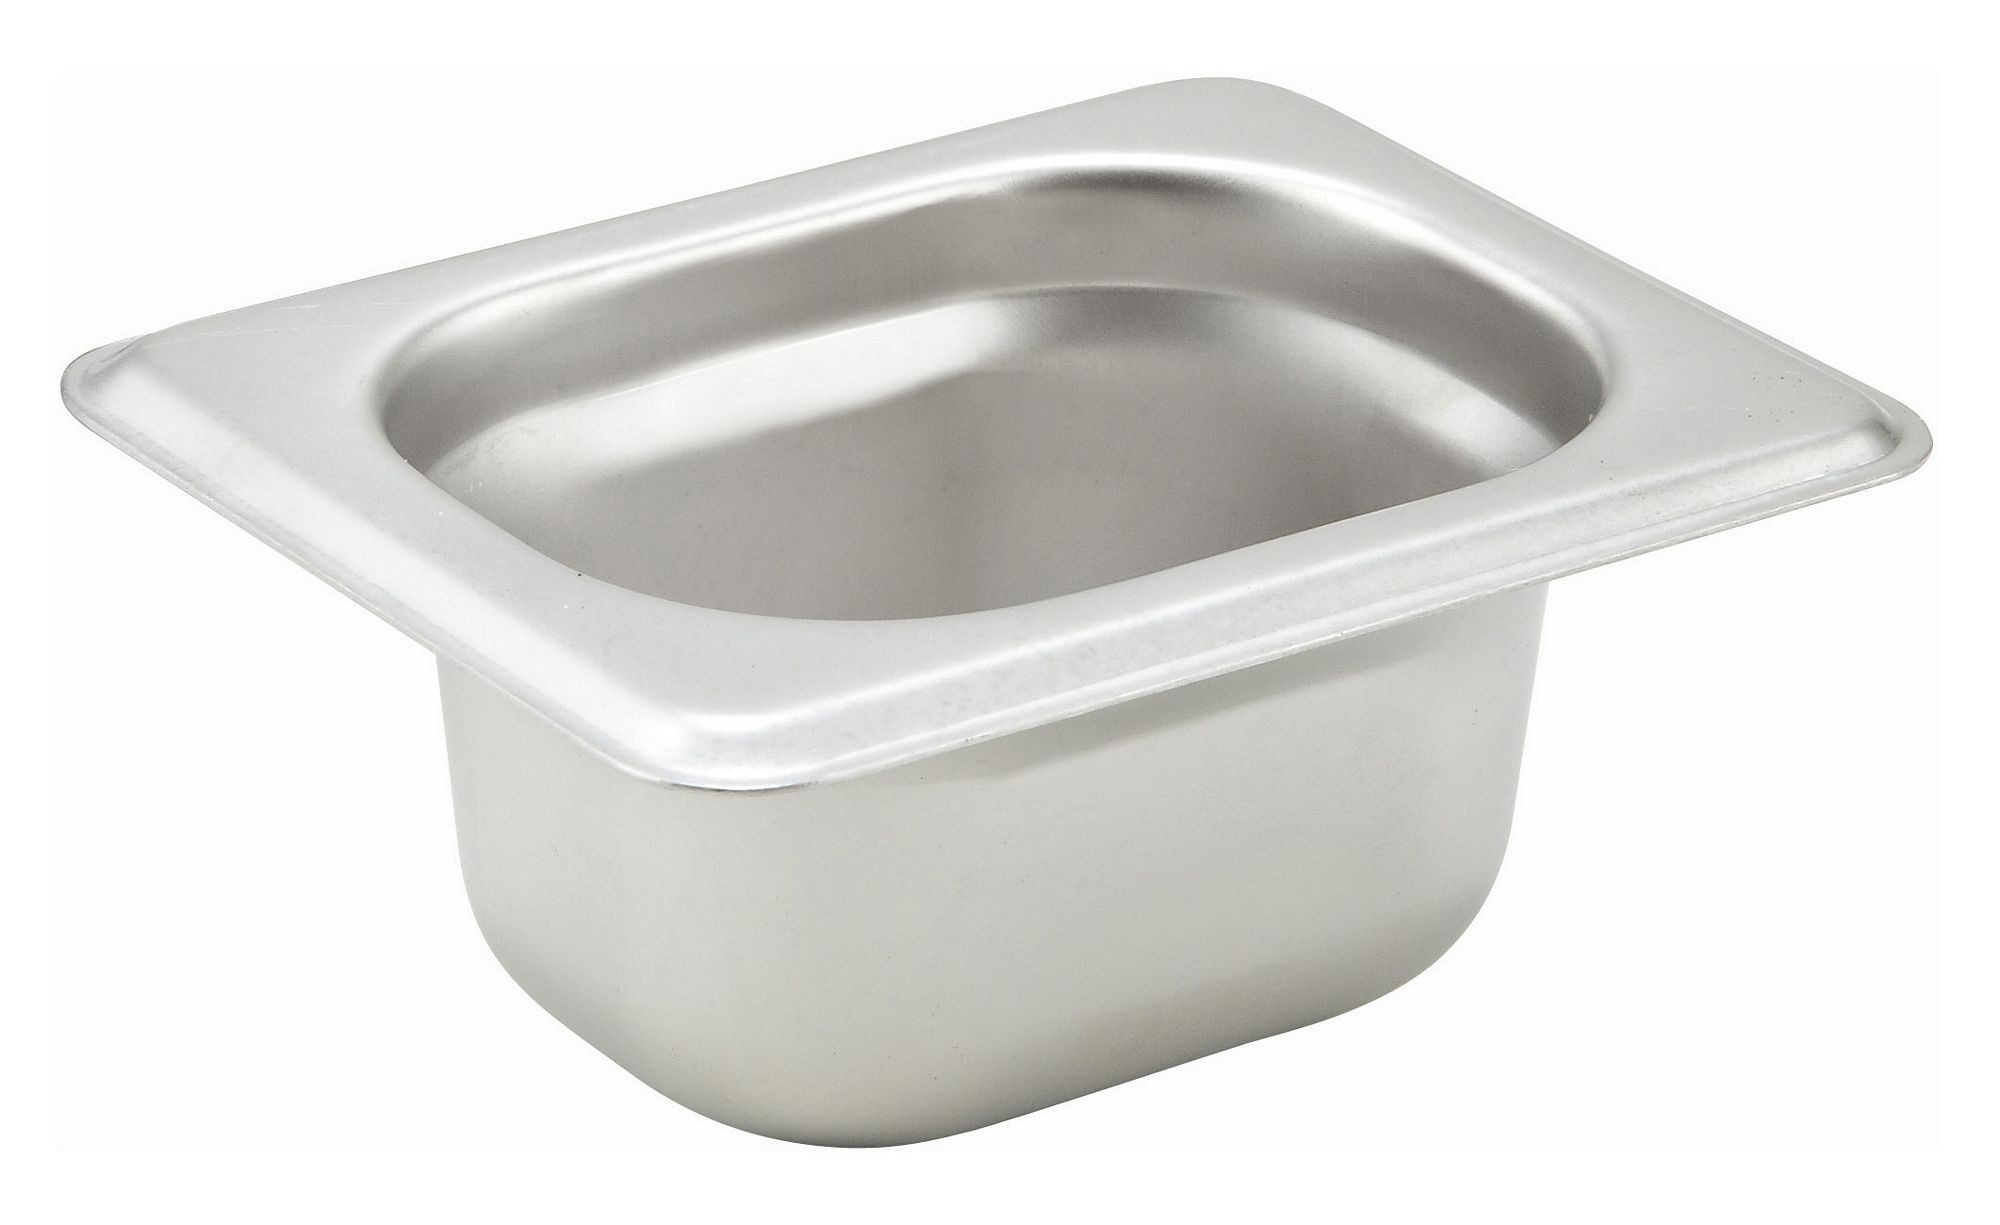 "Winco SPJH-1820 1/18 Size Anti-Jamming Steam Table Pan, 22-Gauge, 2"" Deep"